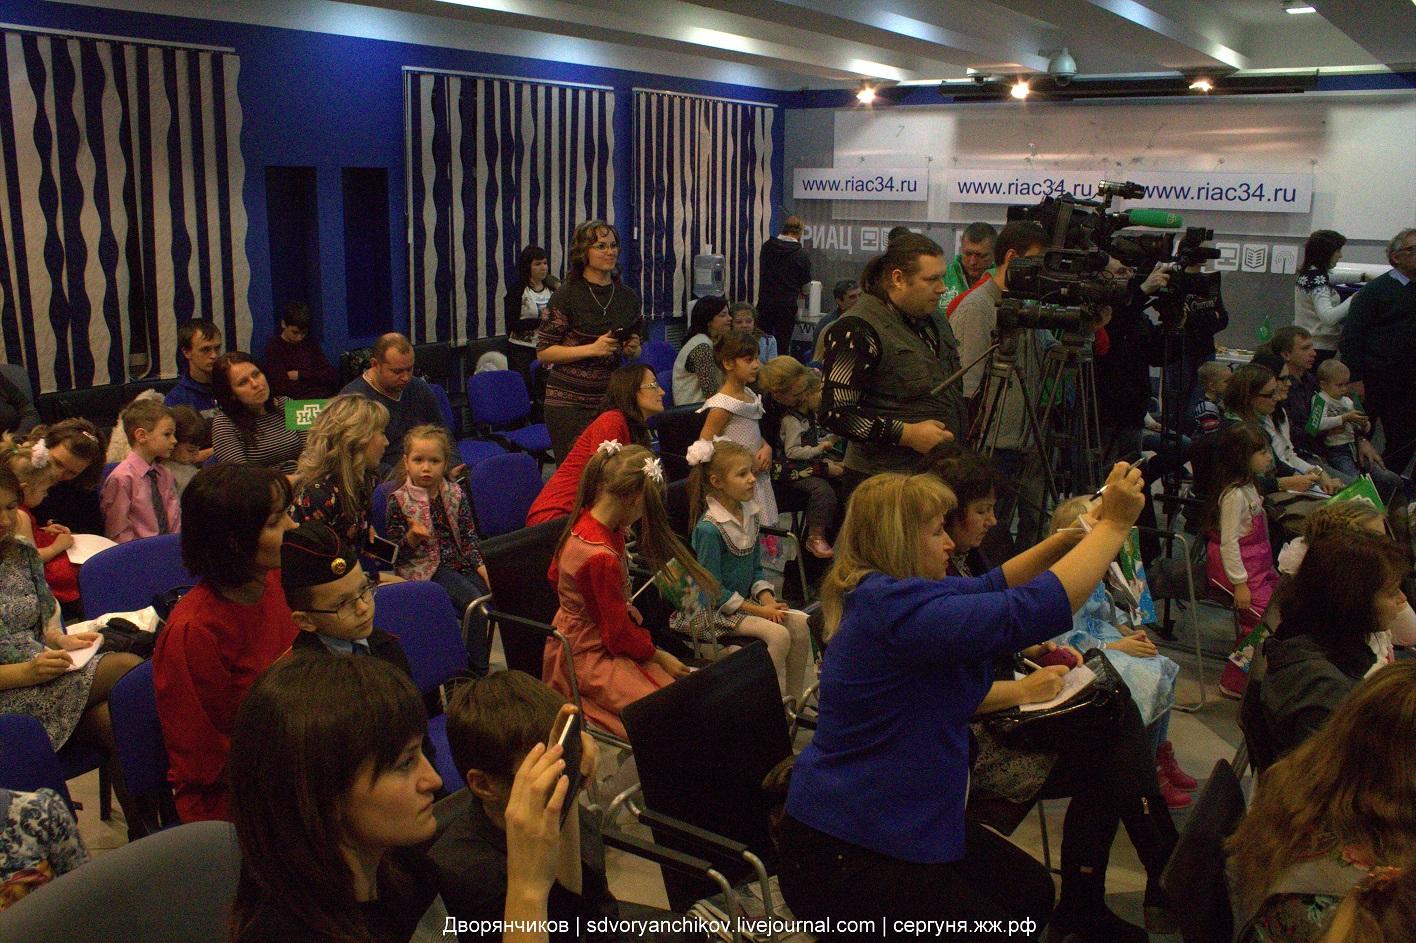 Дед Мороз в Волгограде - пресс-конференция в РИАЦ